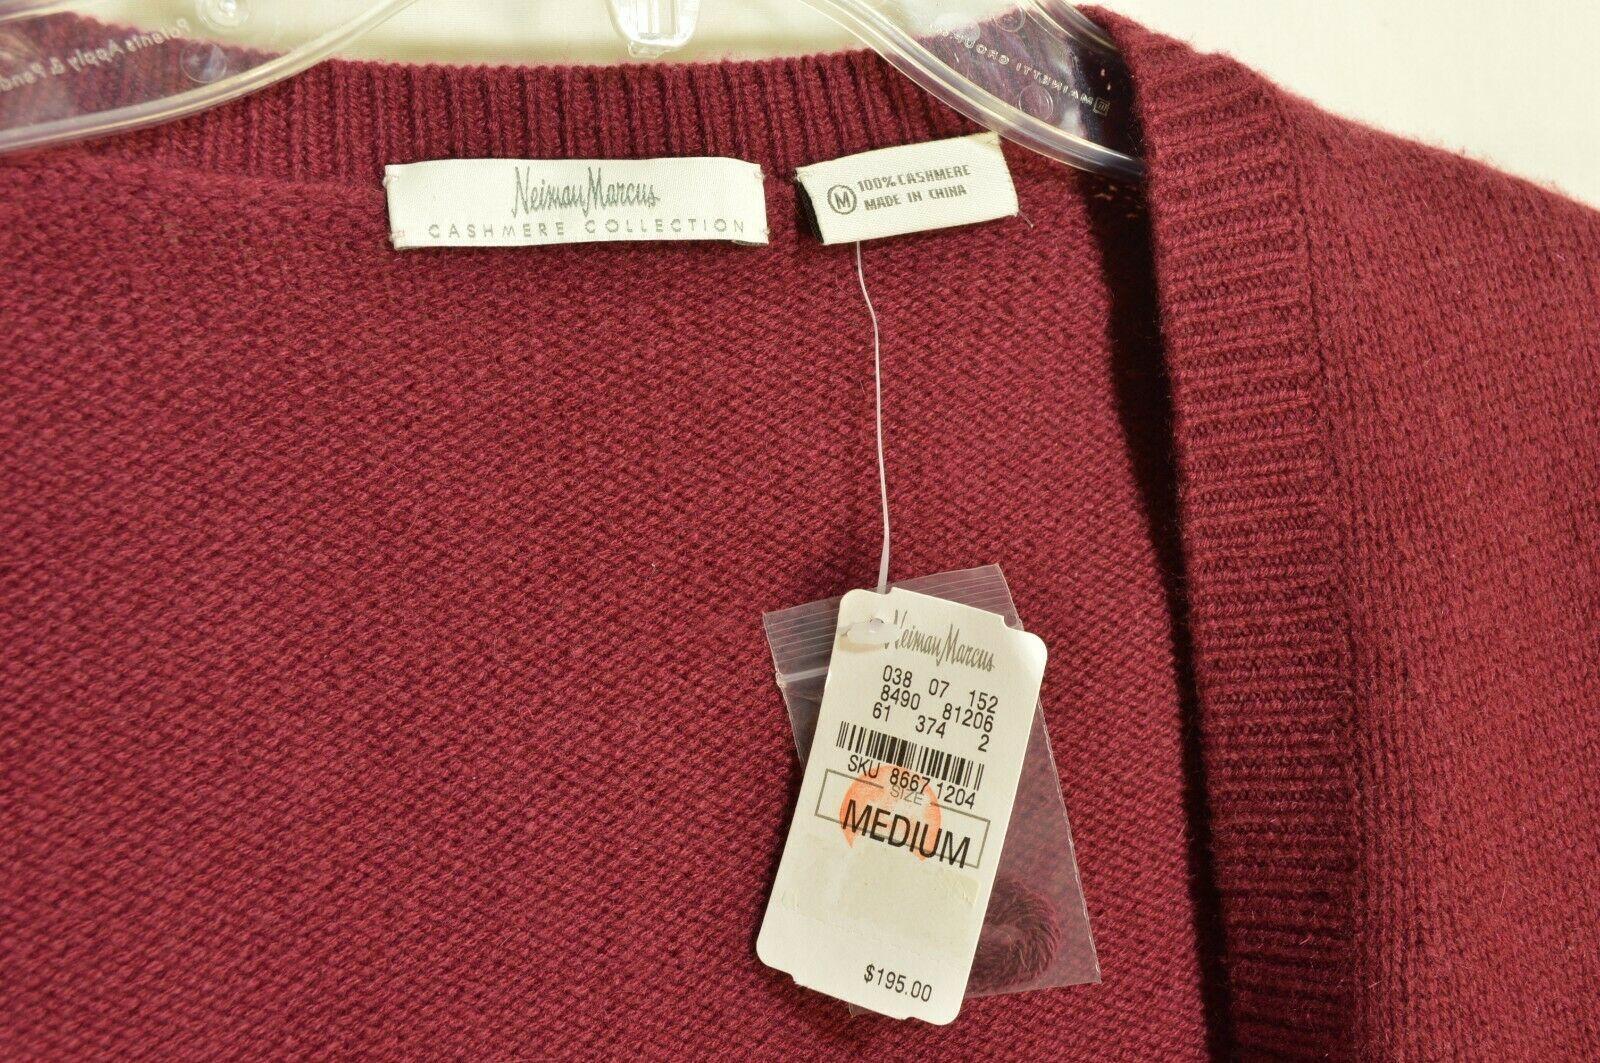 Neiman Marcus sweater M NWT red 100% cashmere shrug bolero cropped $195 new image 9